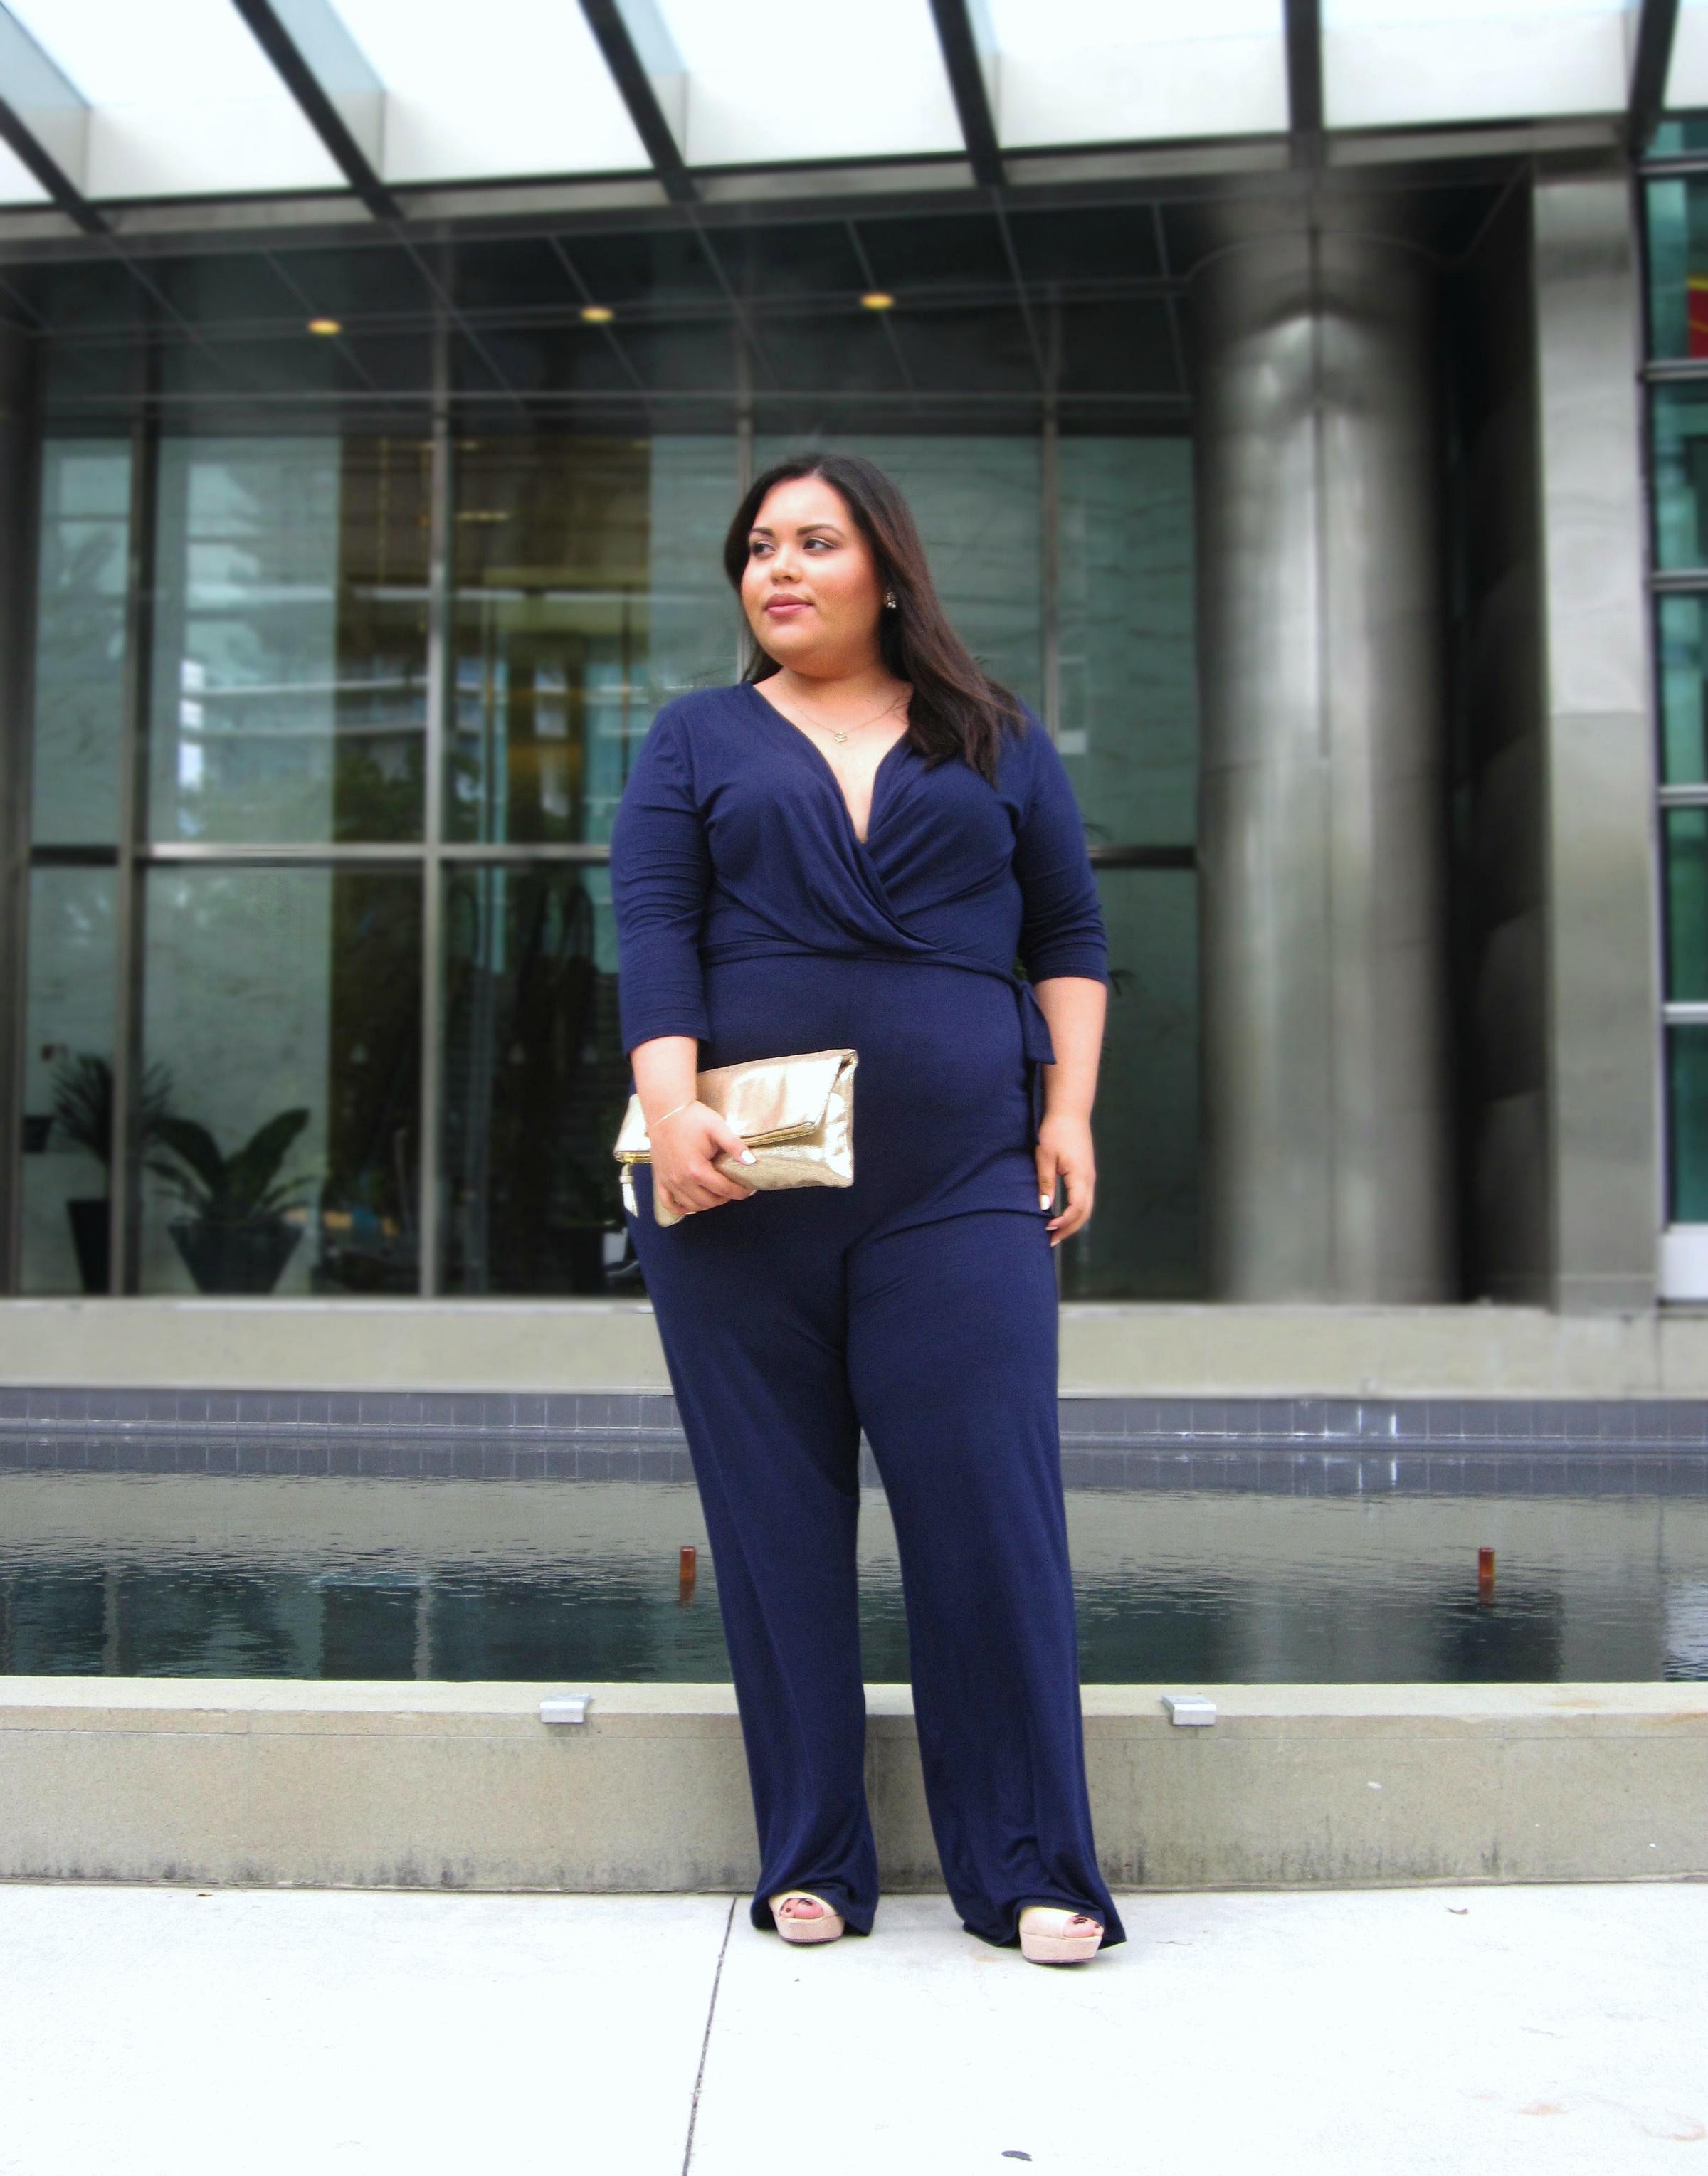 Curves stylish fashion blog